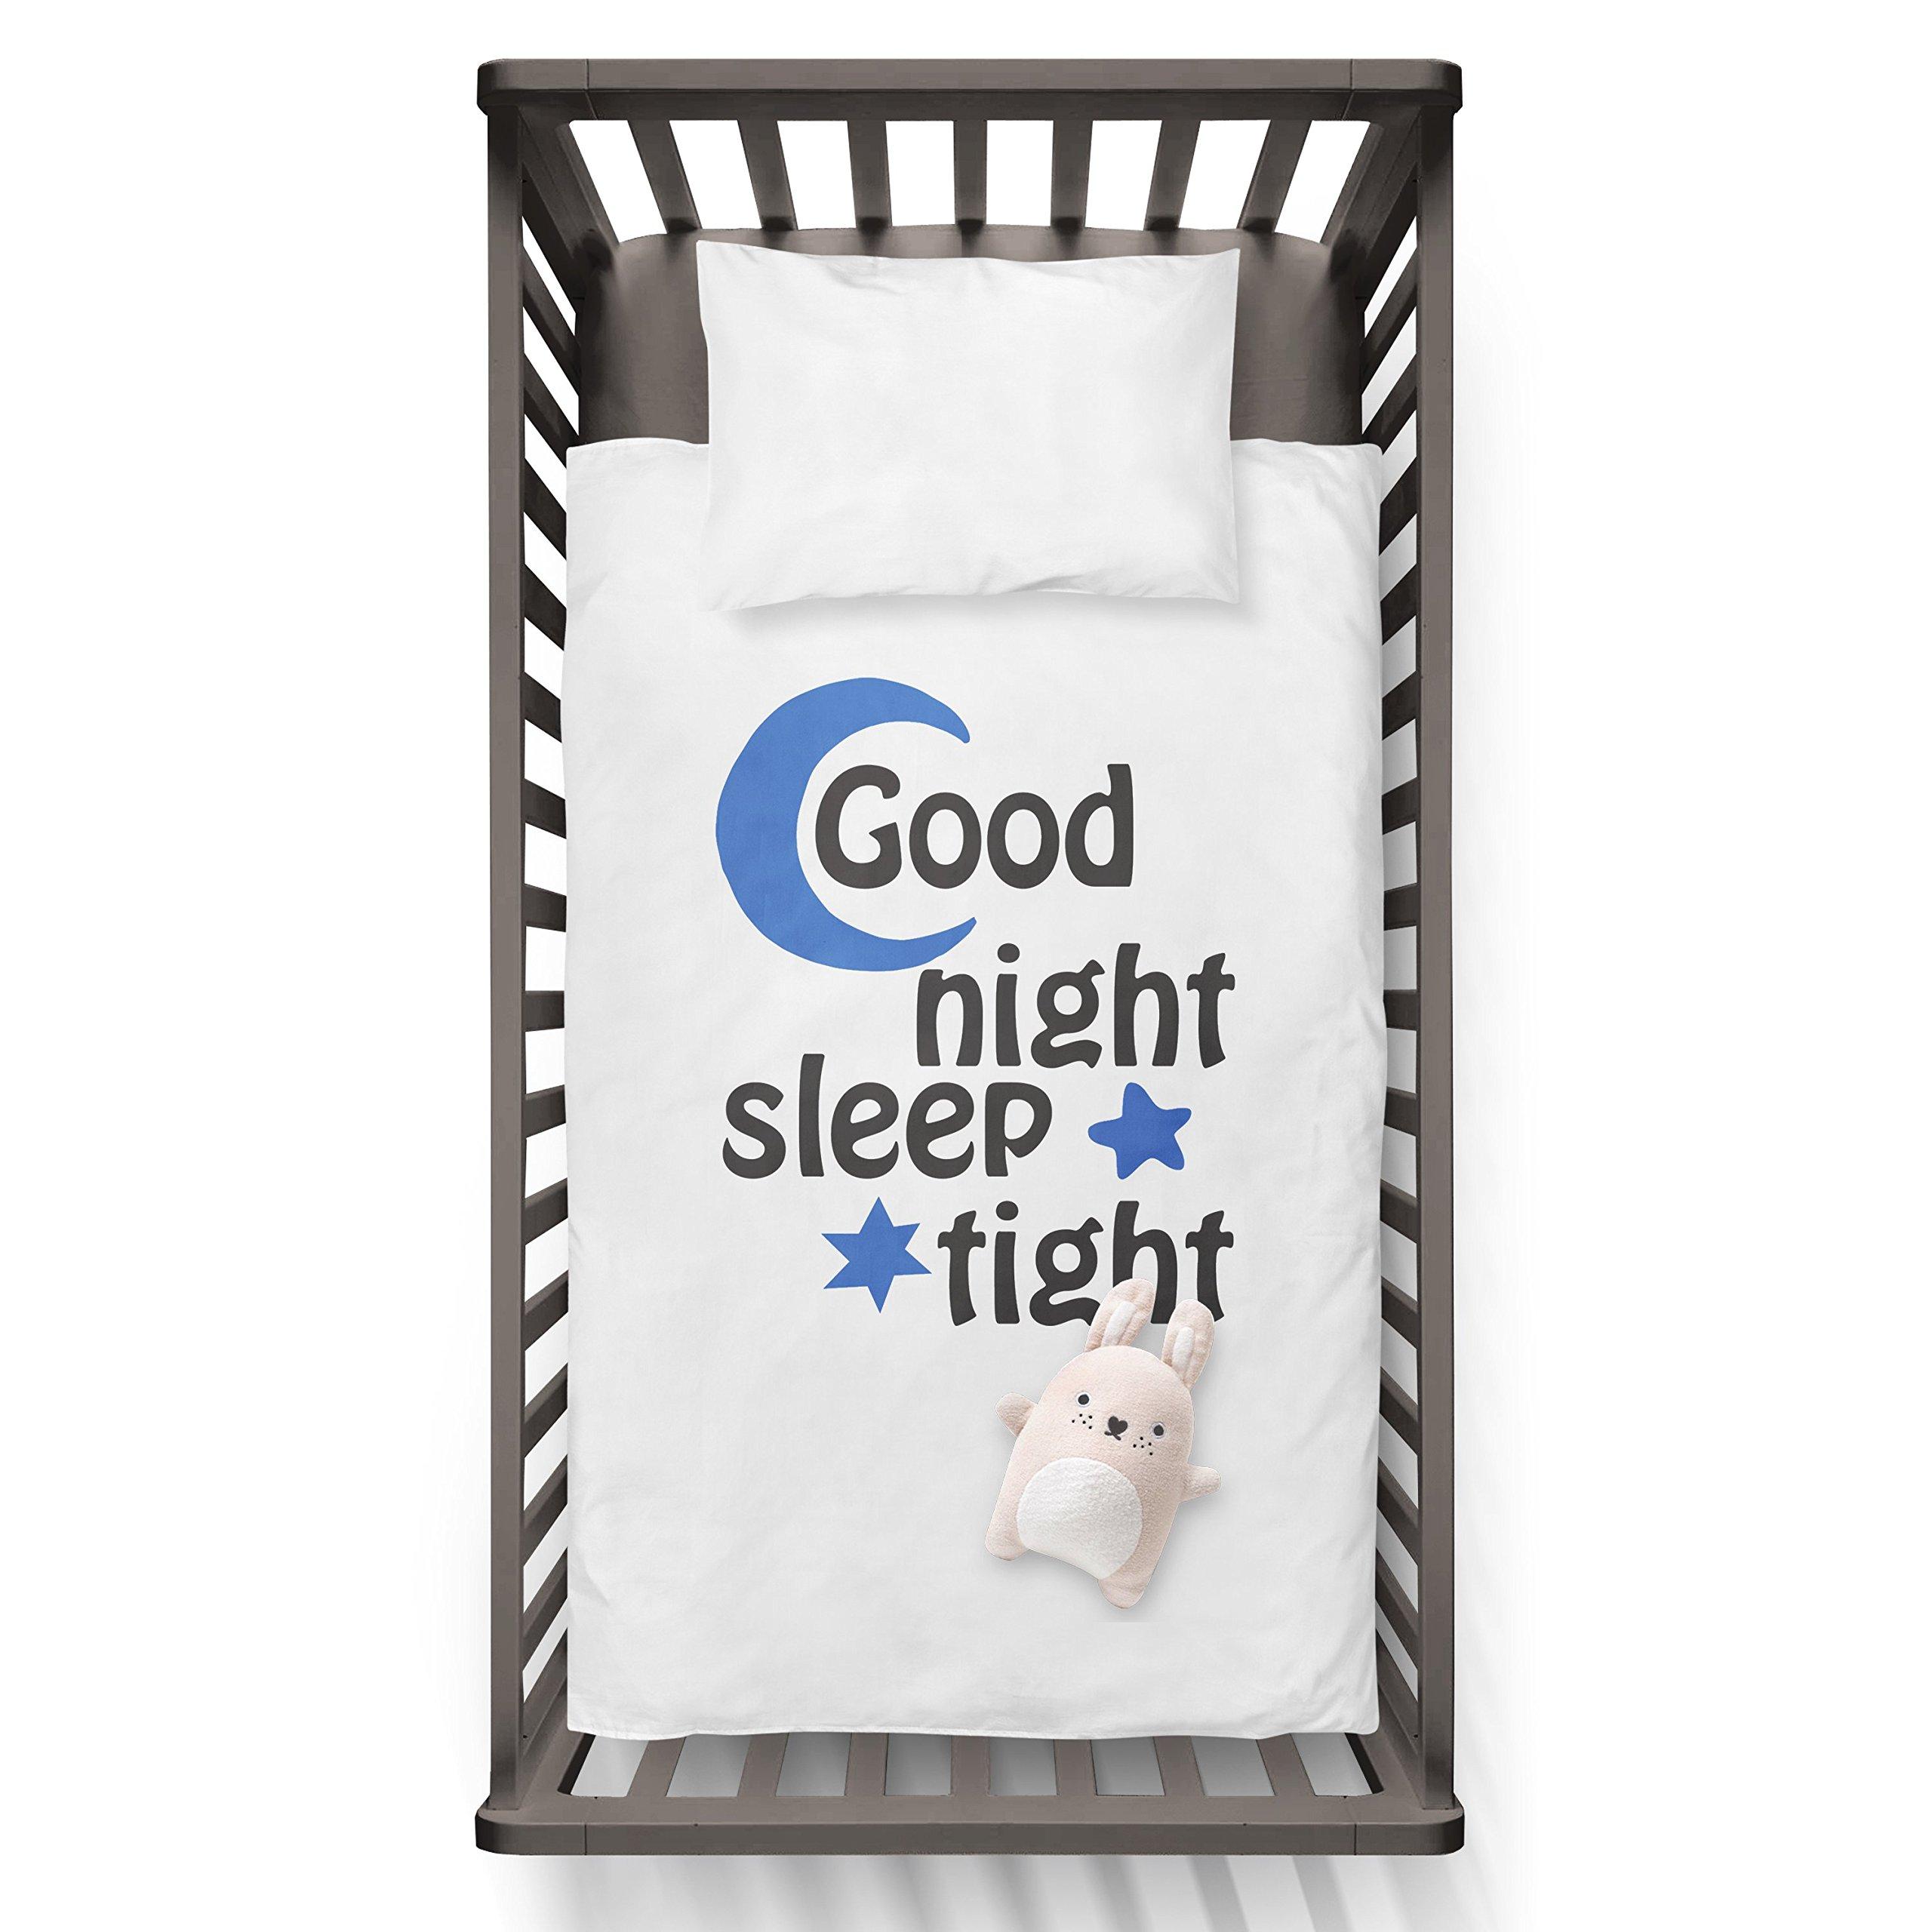 Good Night Sleep Tight Funny Humor Hip Baby Duvet /Pillow set,Toddler Duvet,Oeko-Tex,Personalized duvet and pillow,Oraganic,gift